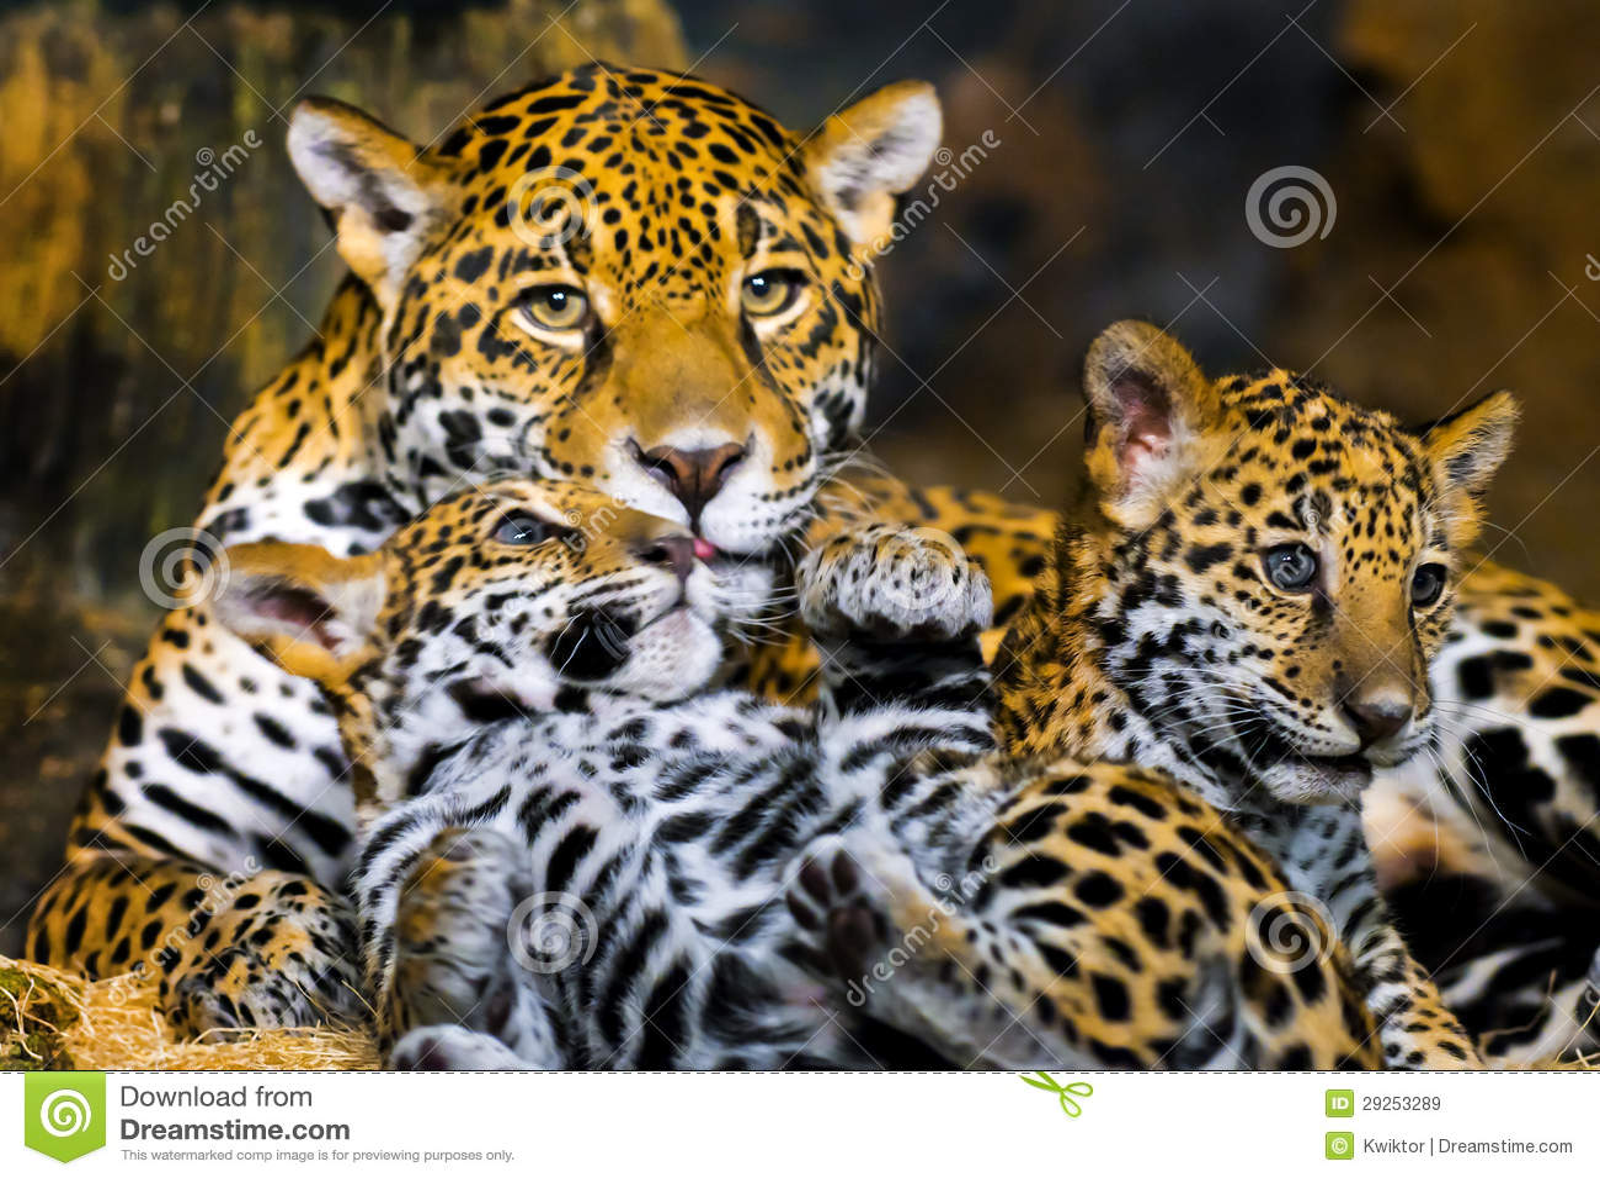 jaguar cubs royalty free stock images image 29253289